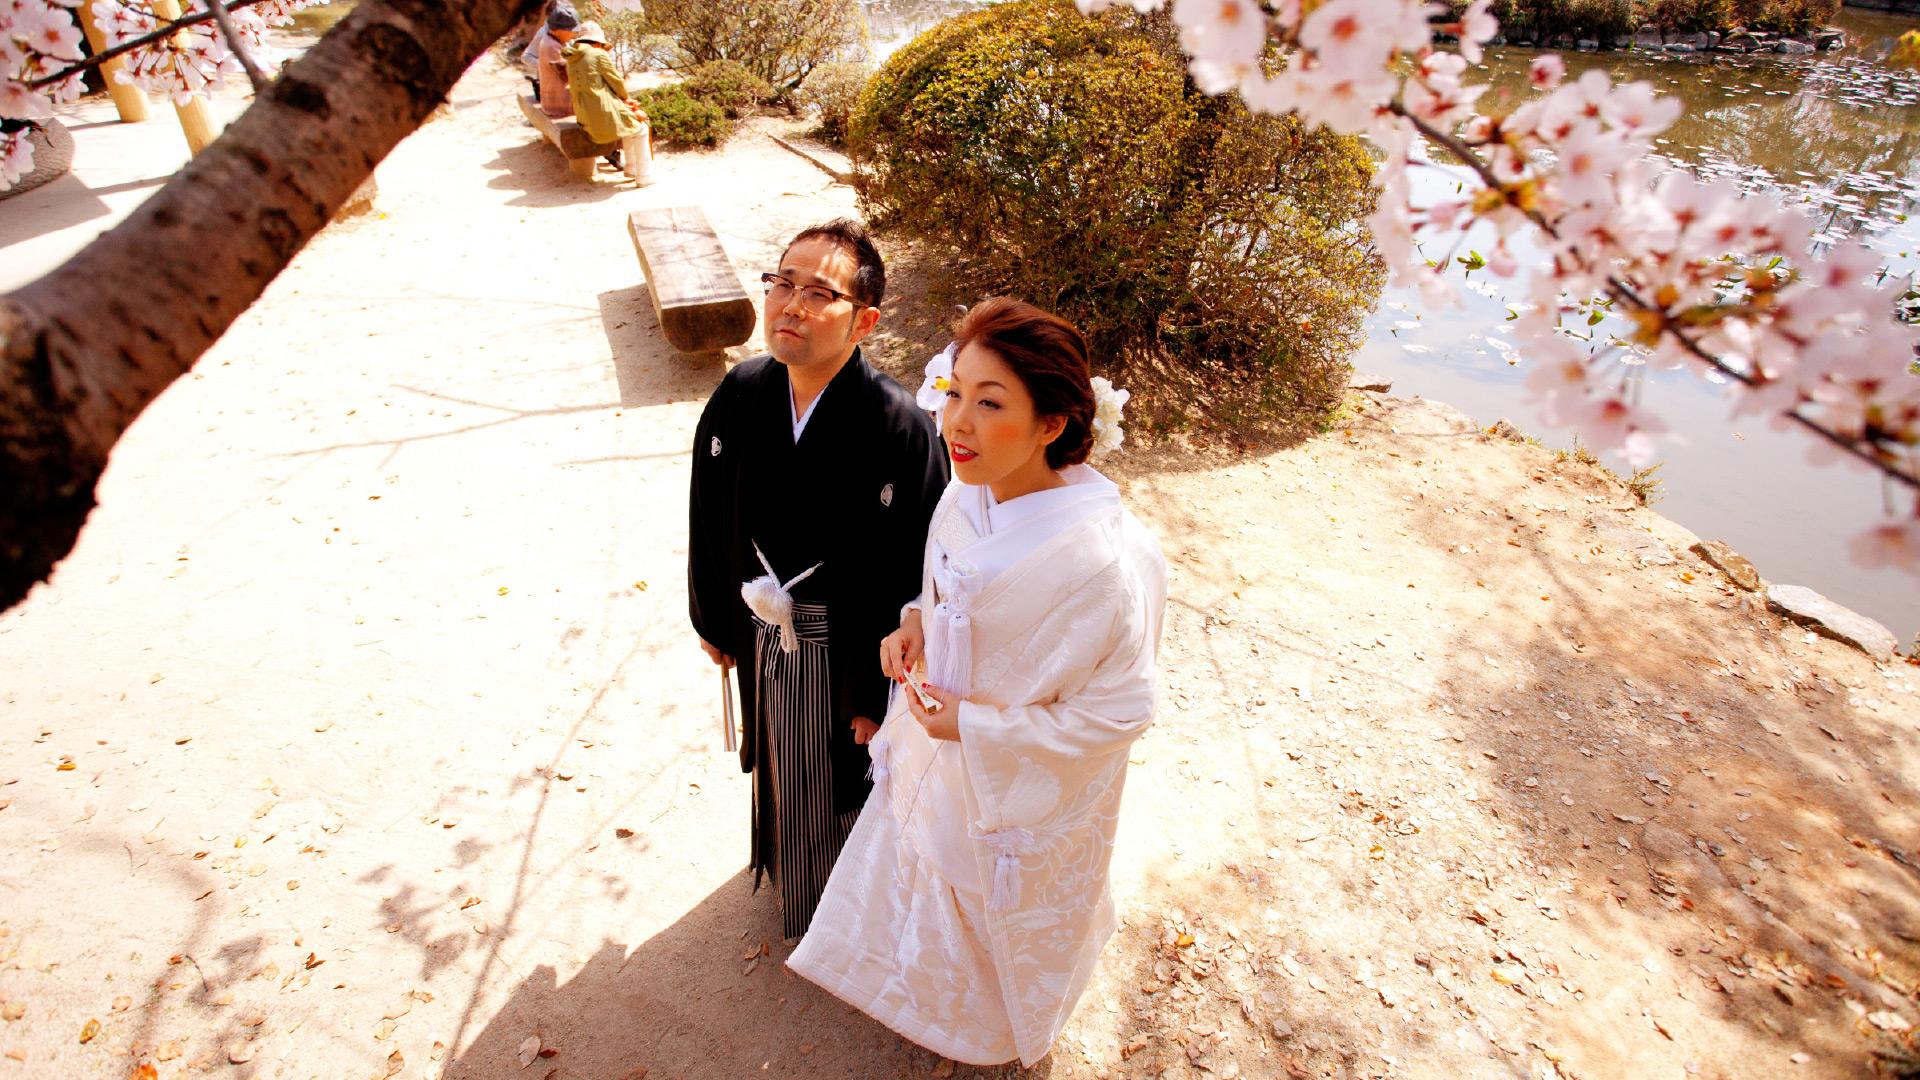 shigematsu_happy_wedding